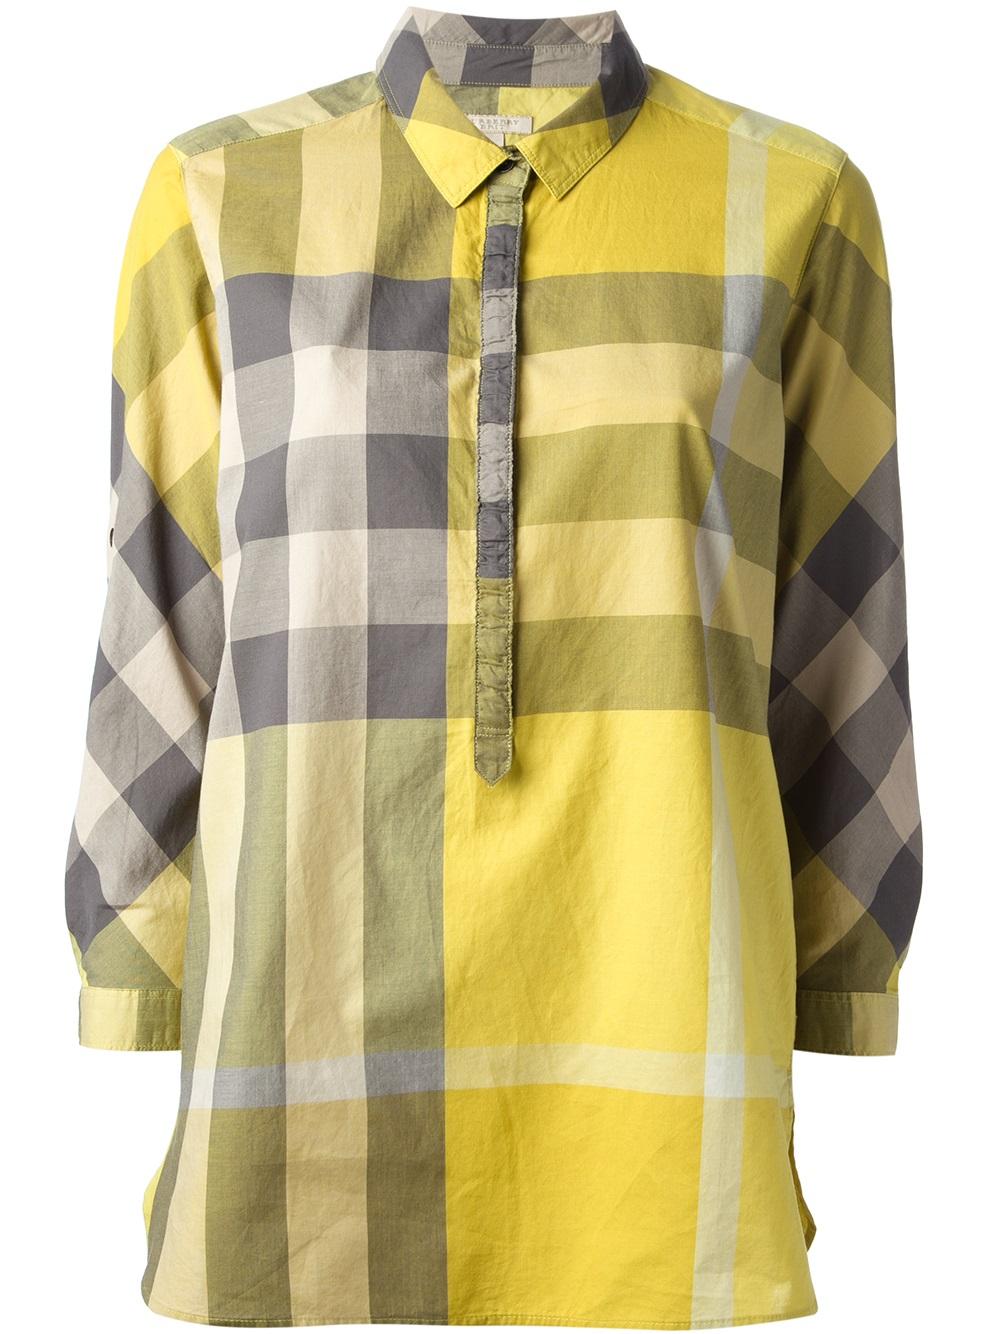 Three Quarter Sleeve Shirts For Women